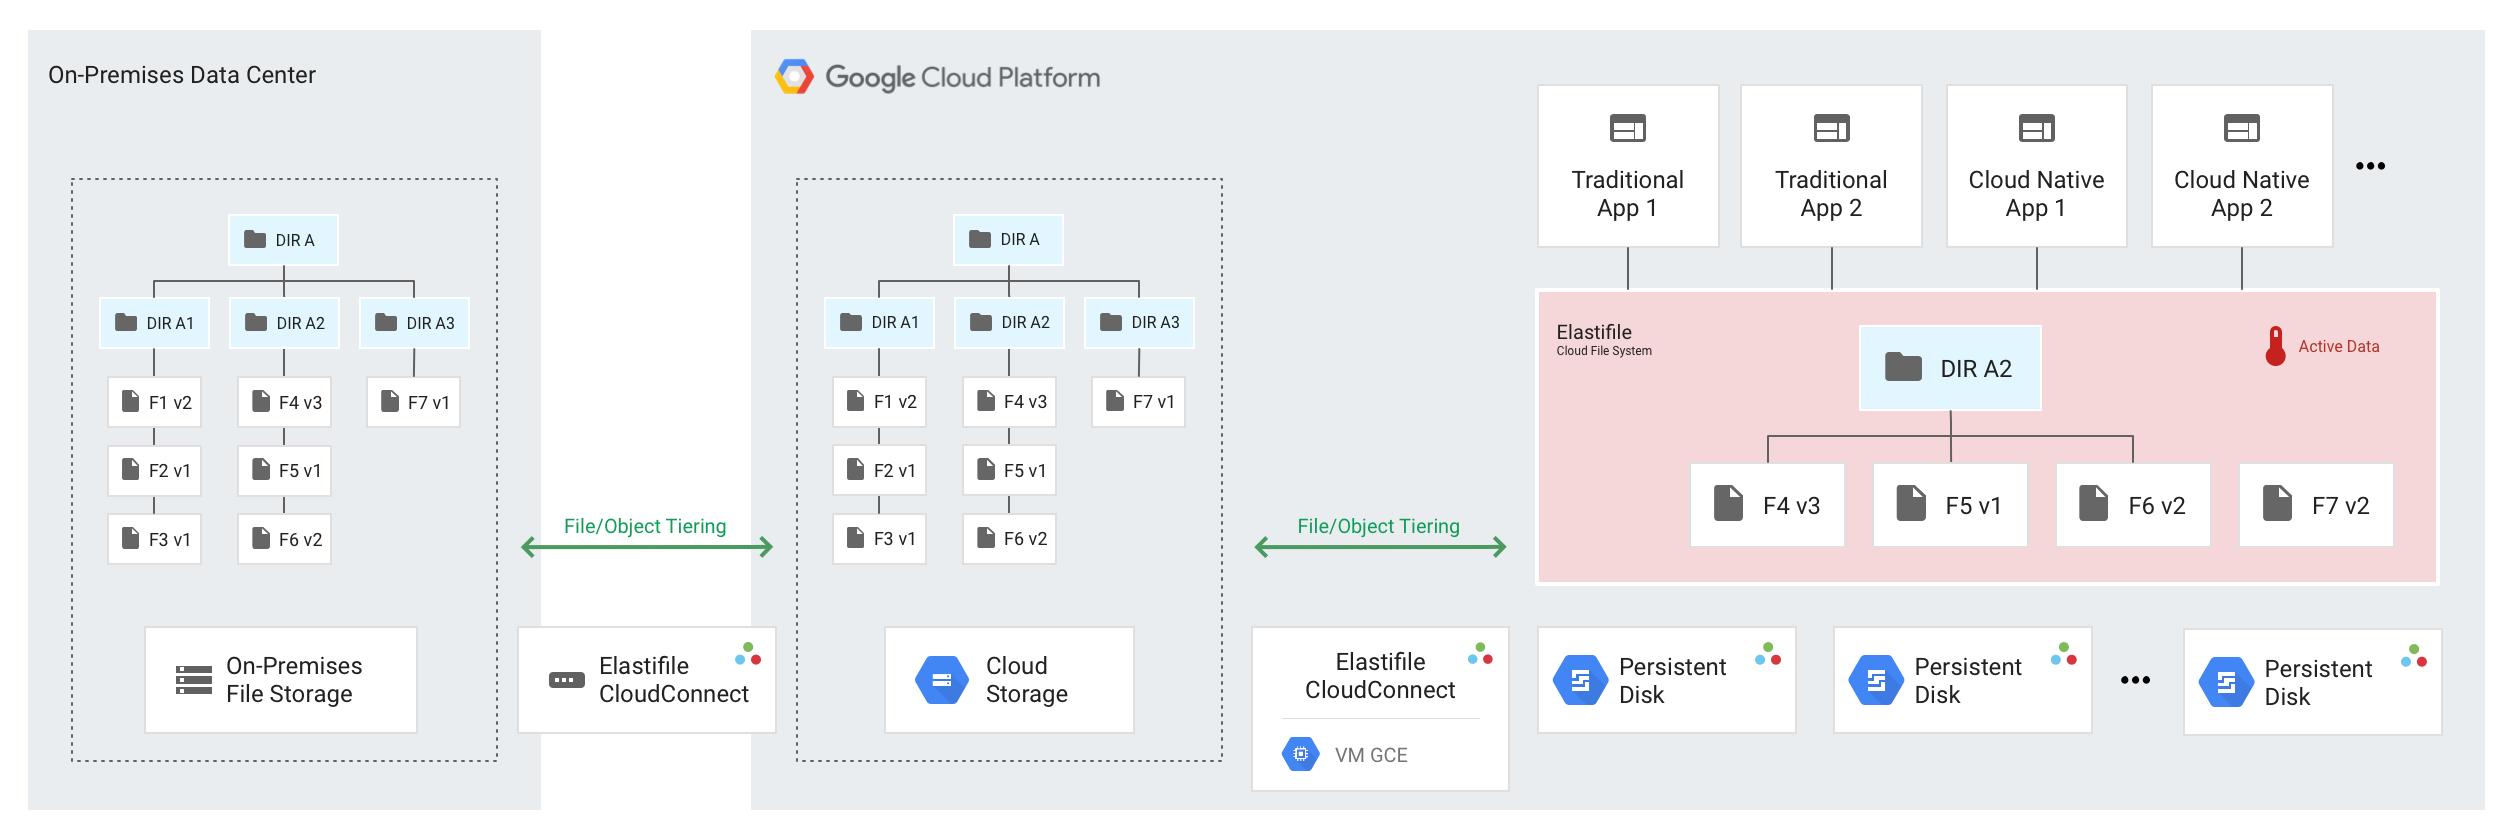 Elastifile 数据存储和管理图